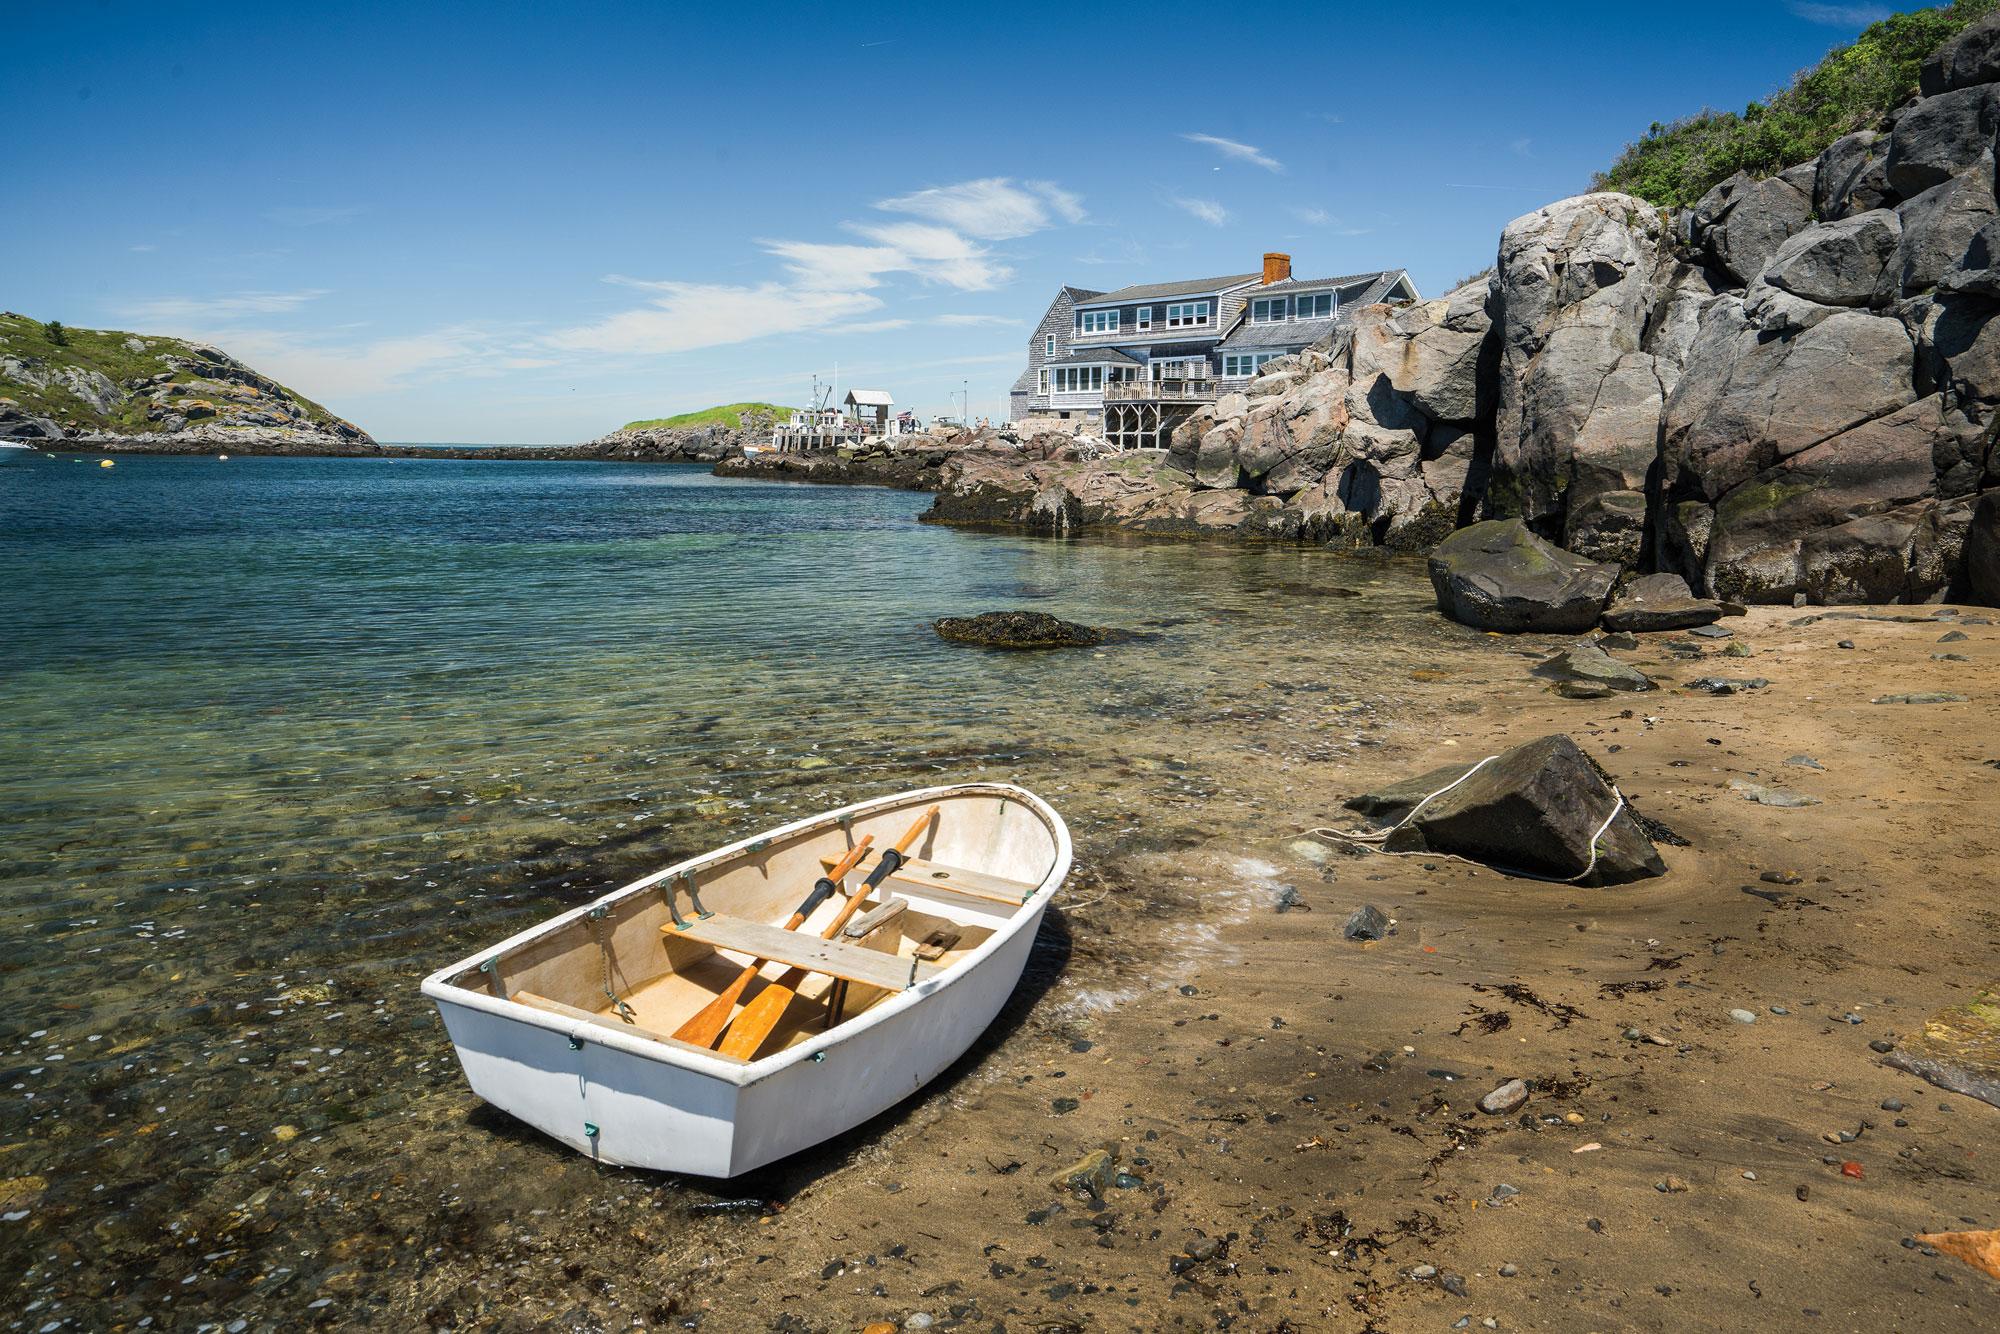 Swim Beach, Monhegan, Maine